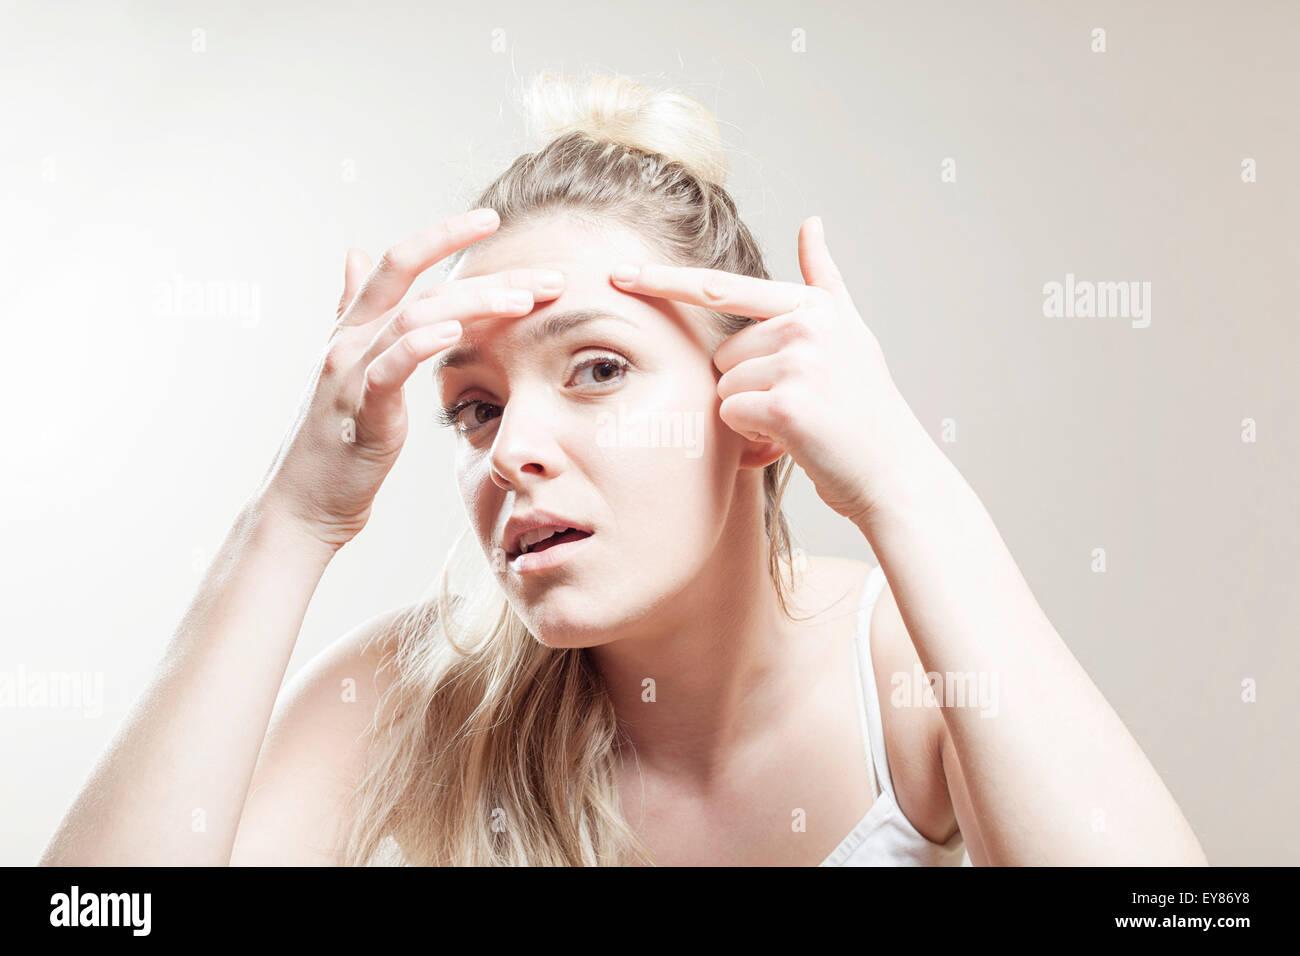 Young woman examining face - Stock Image